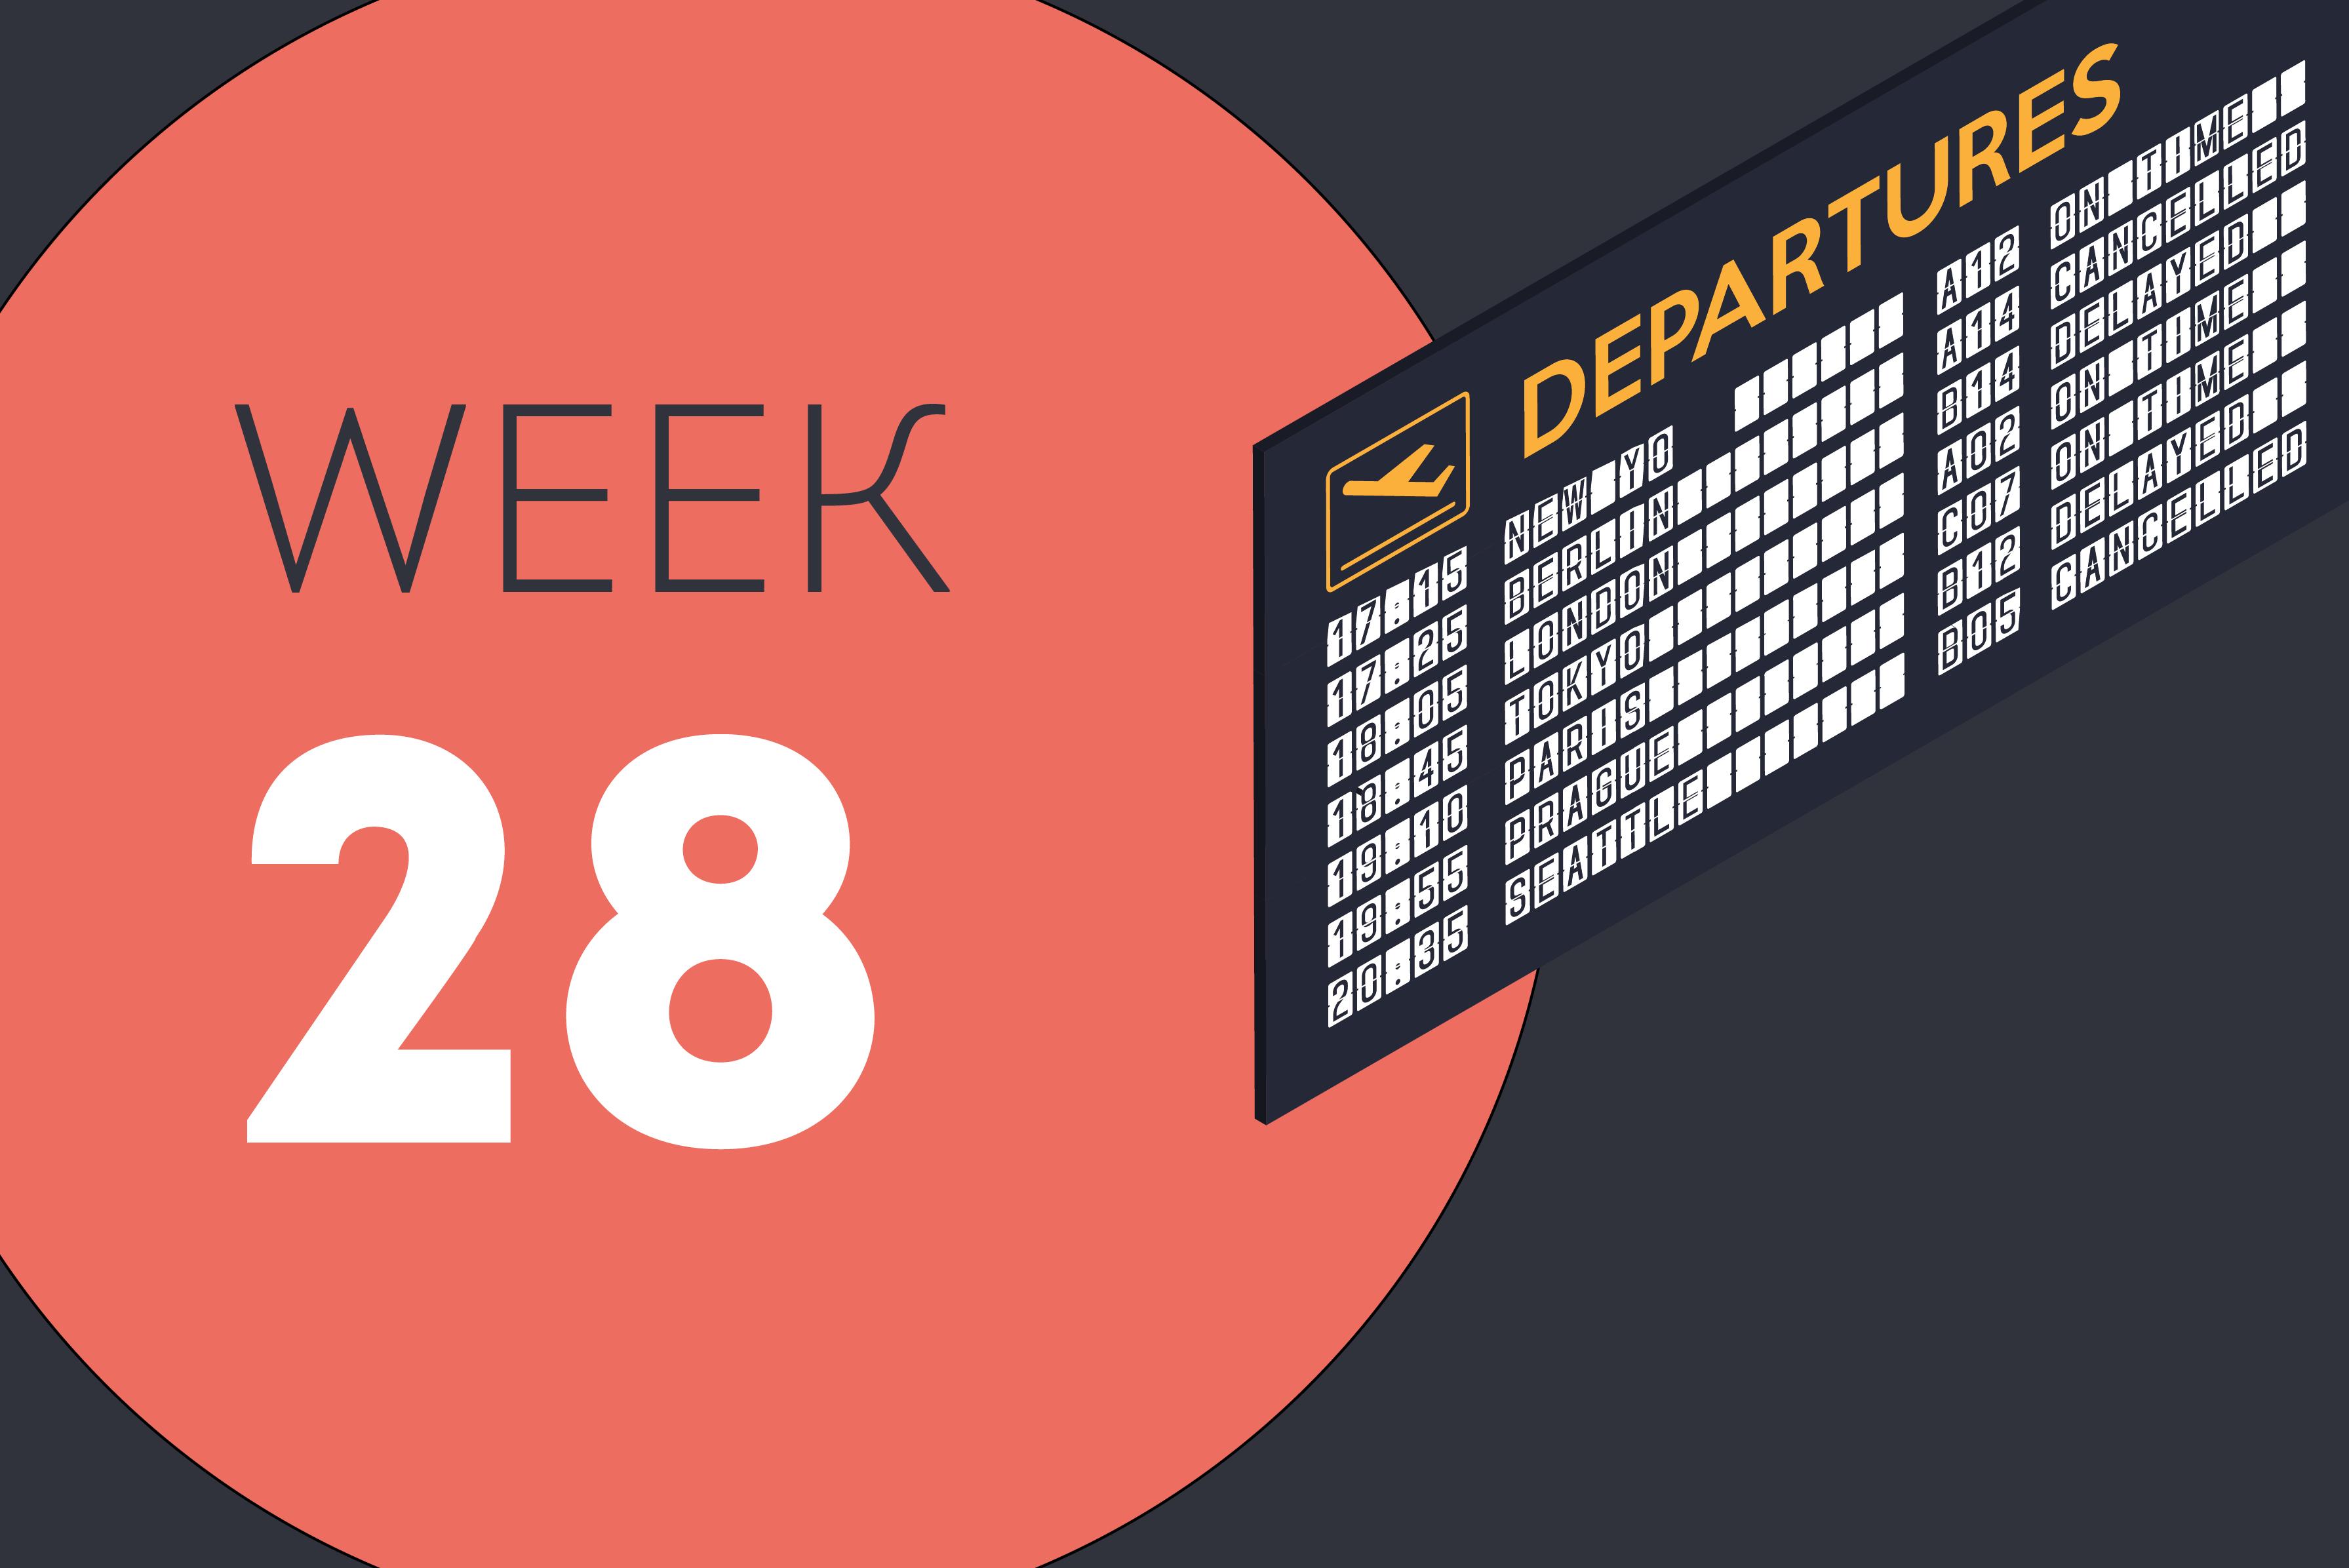 Week ending Friday 16 October 2020